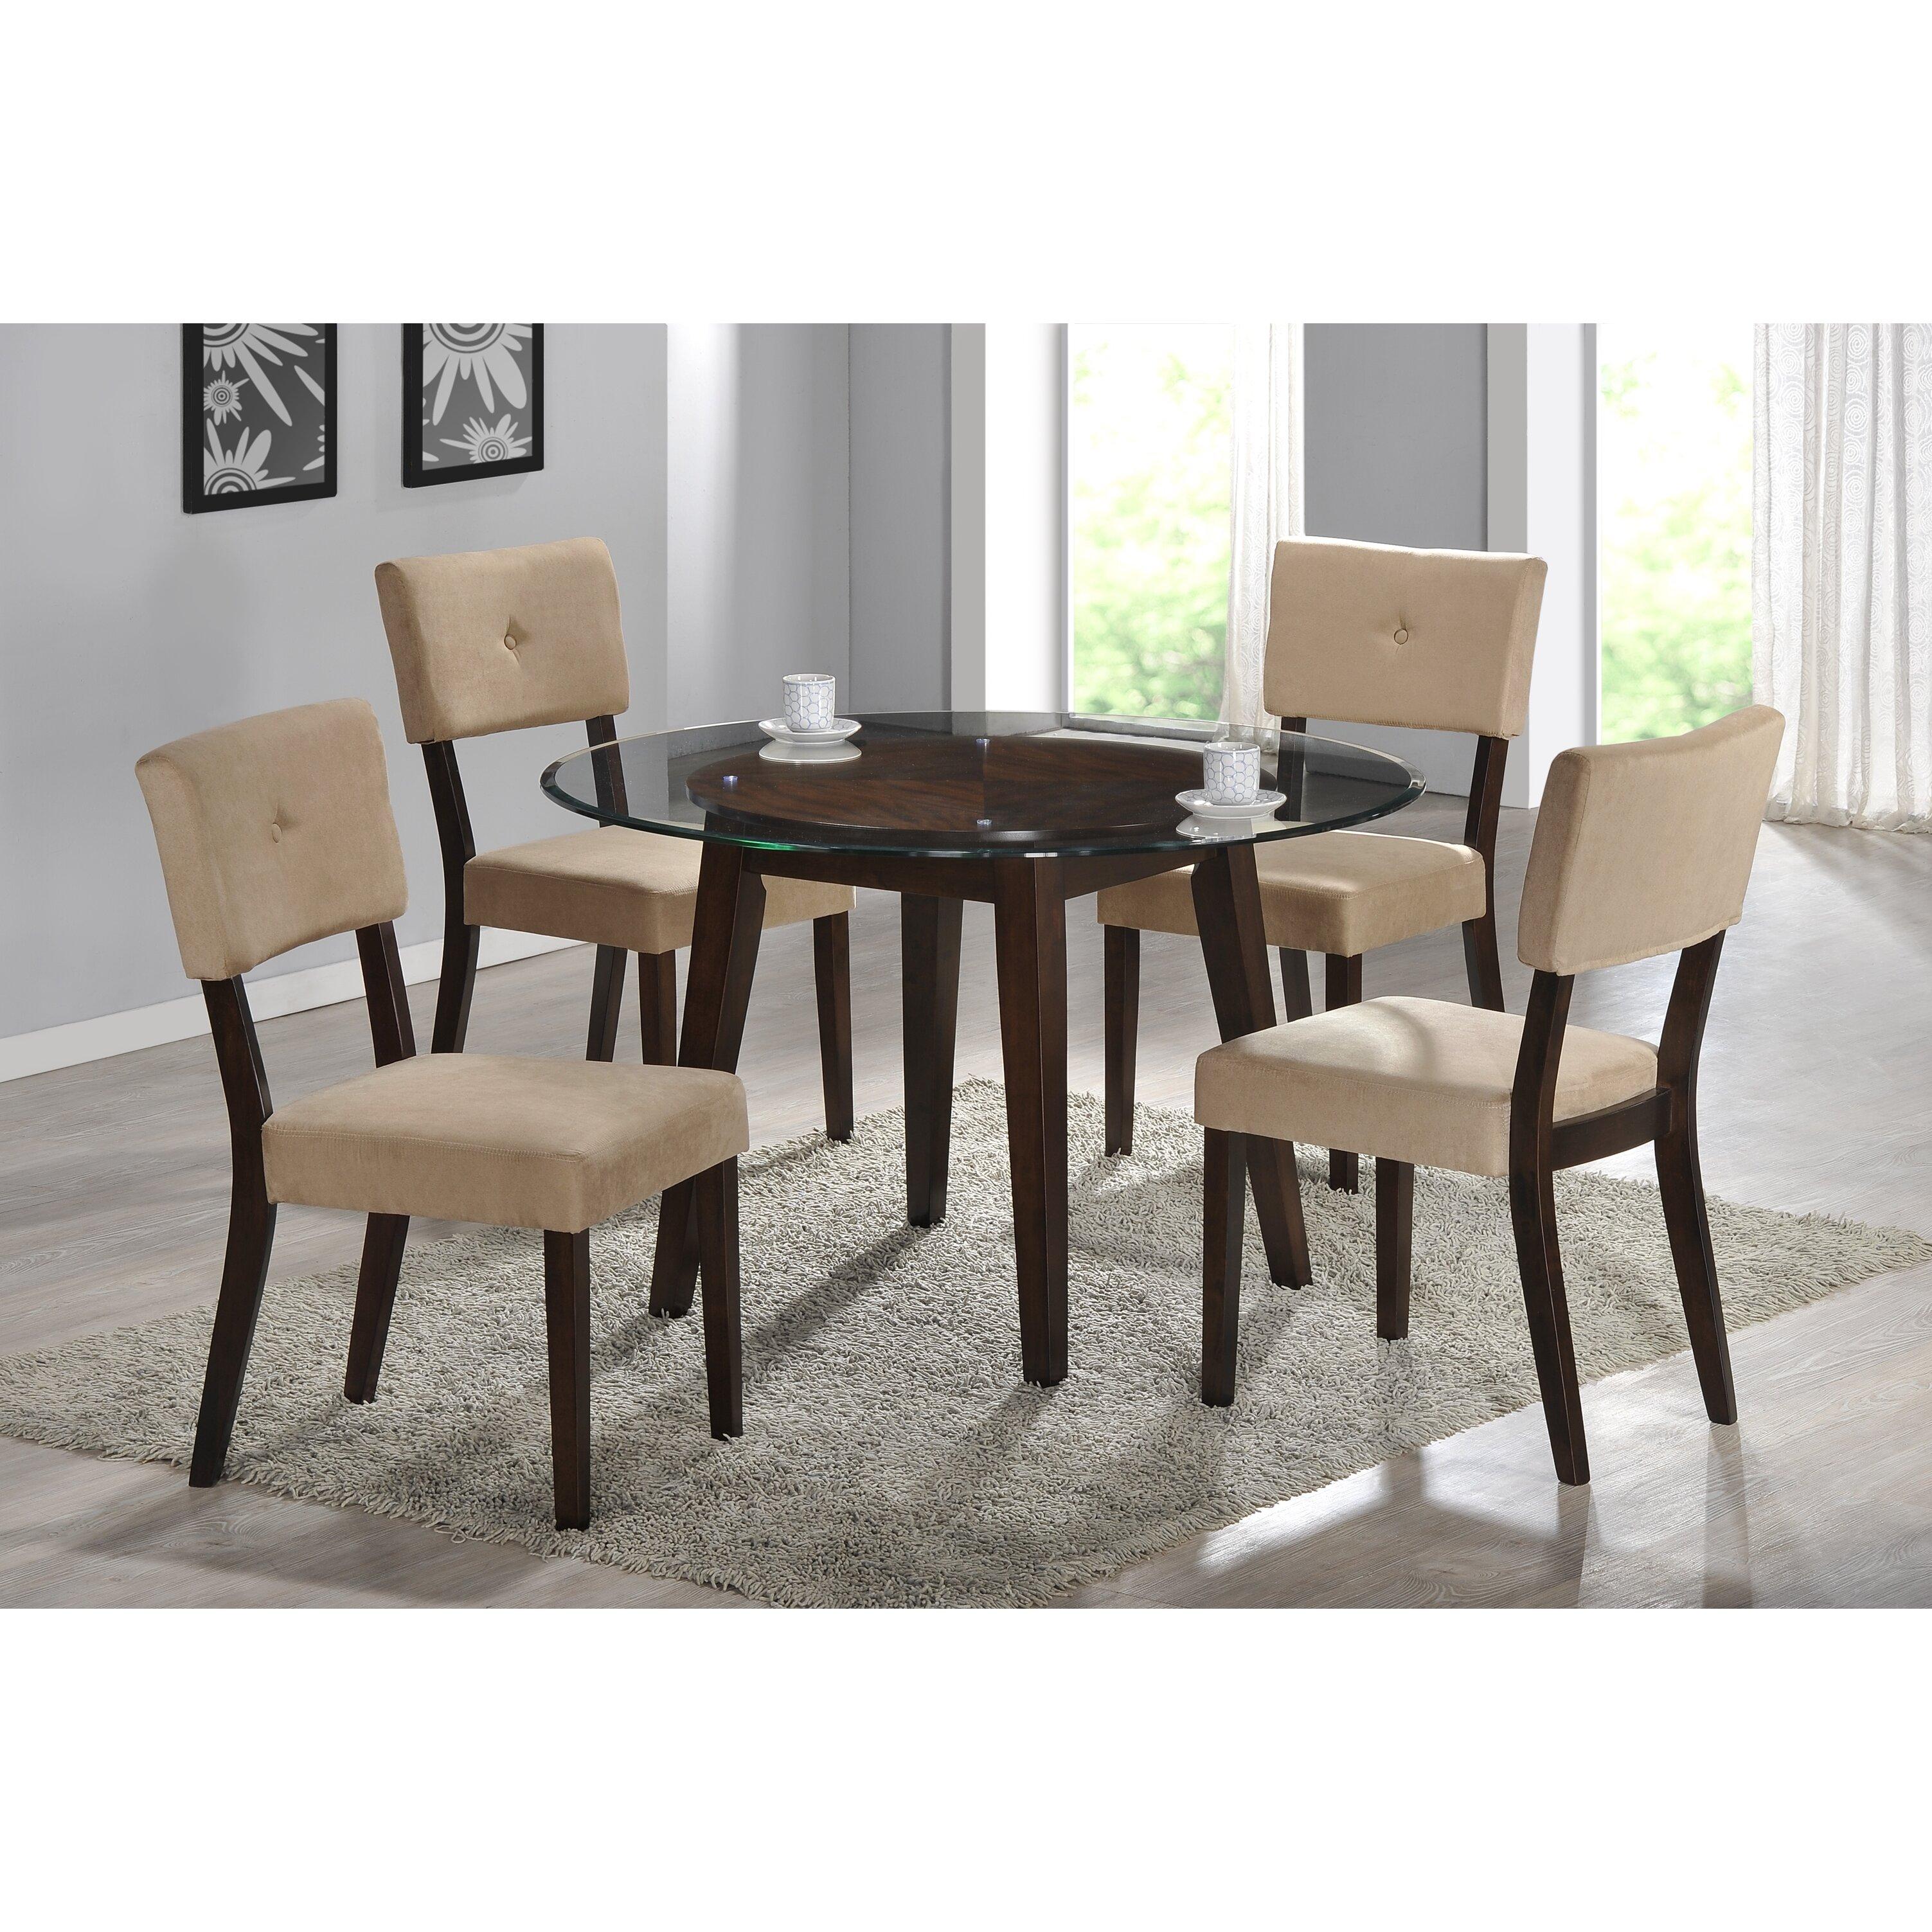 Wildon home wegman dining table reviews wayfair for Wildon home dining